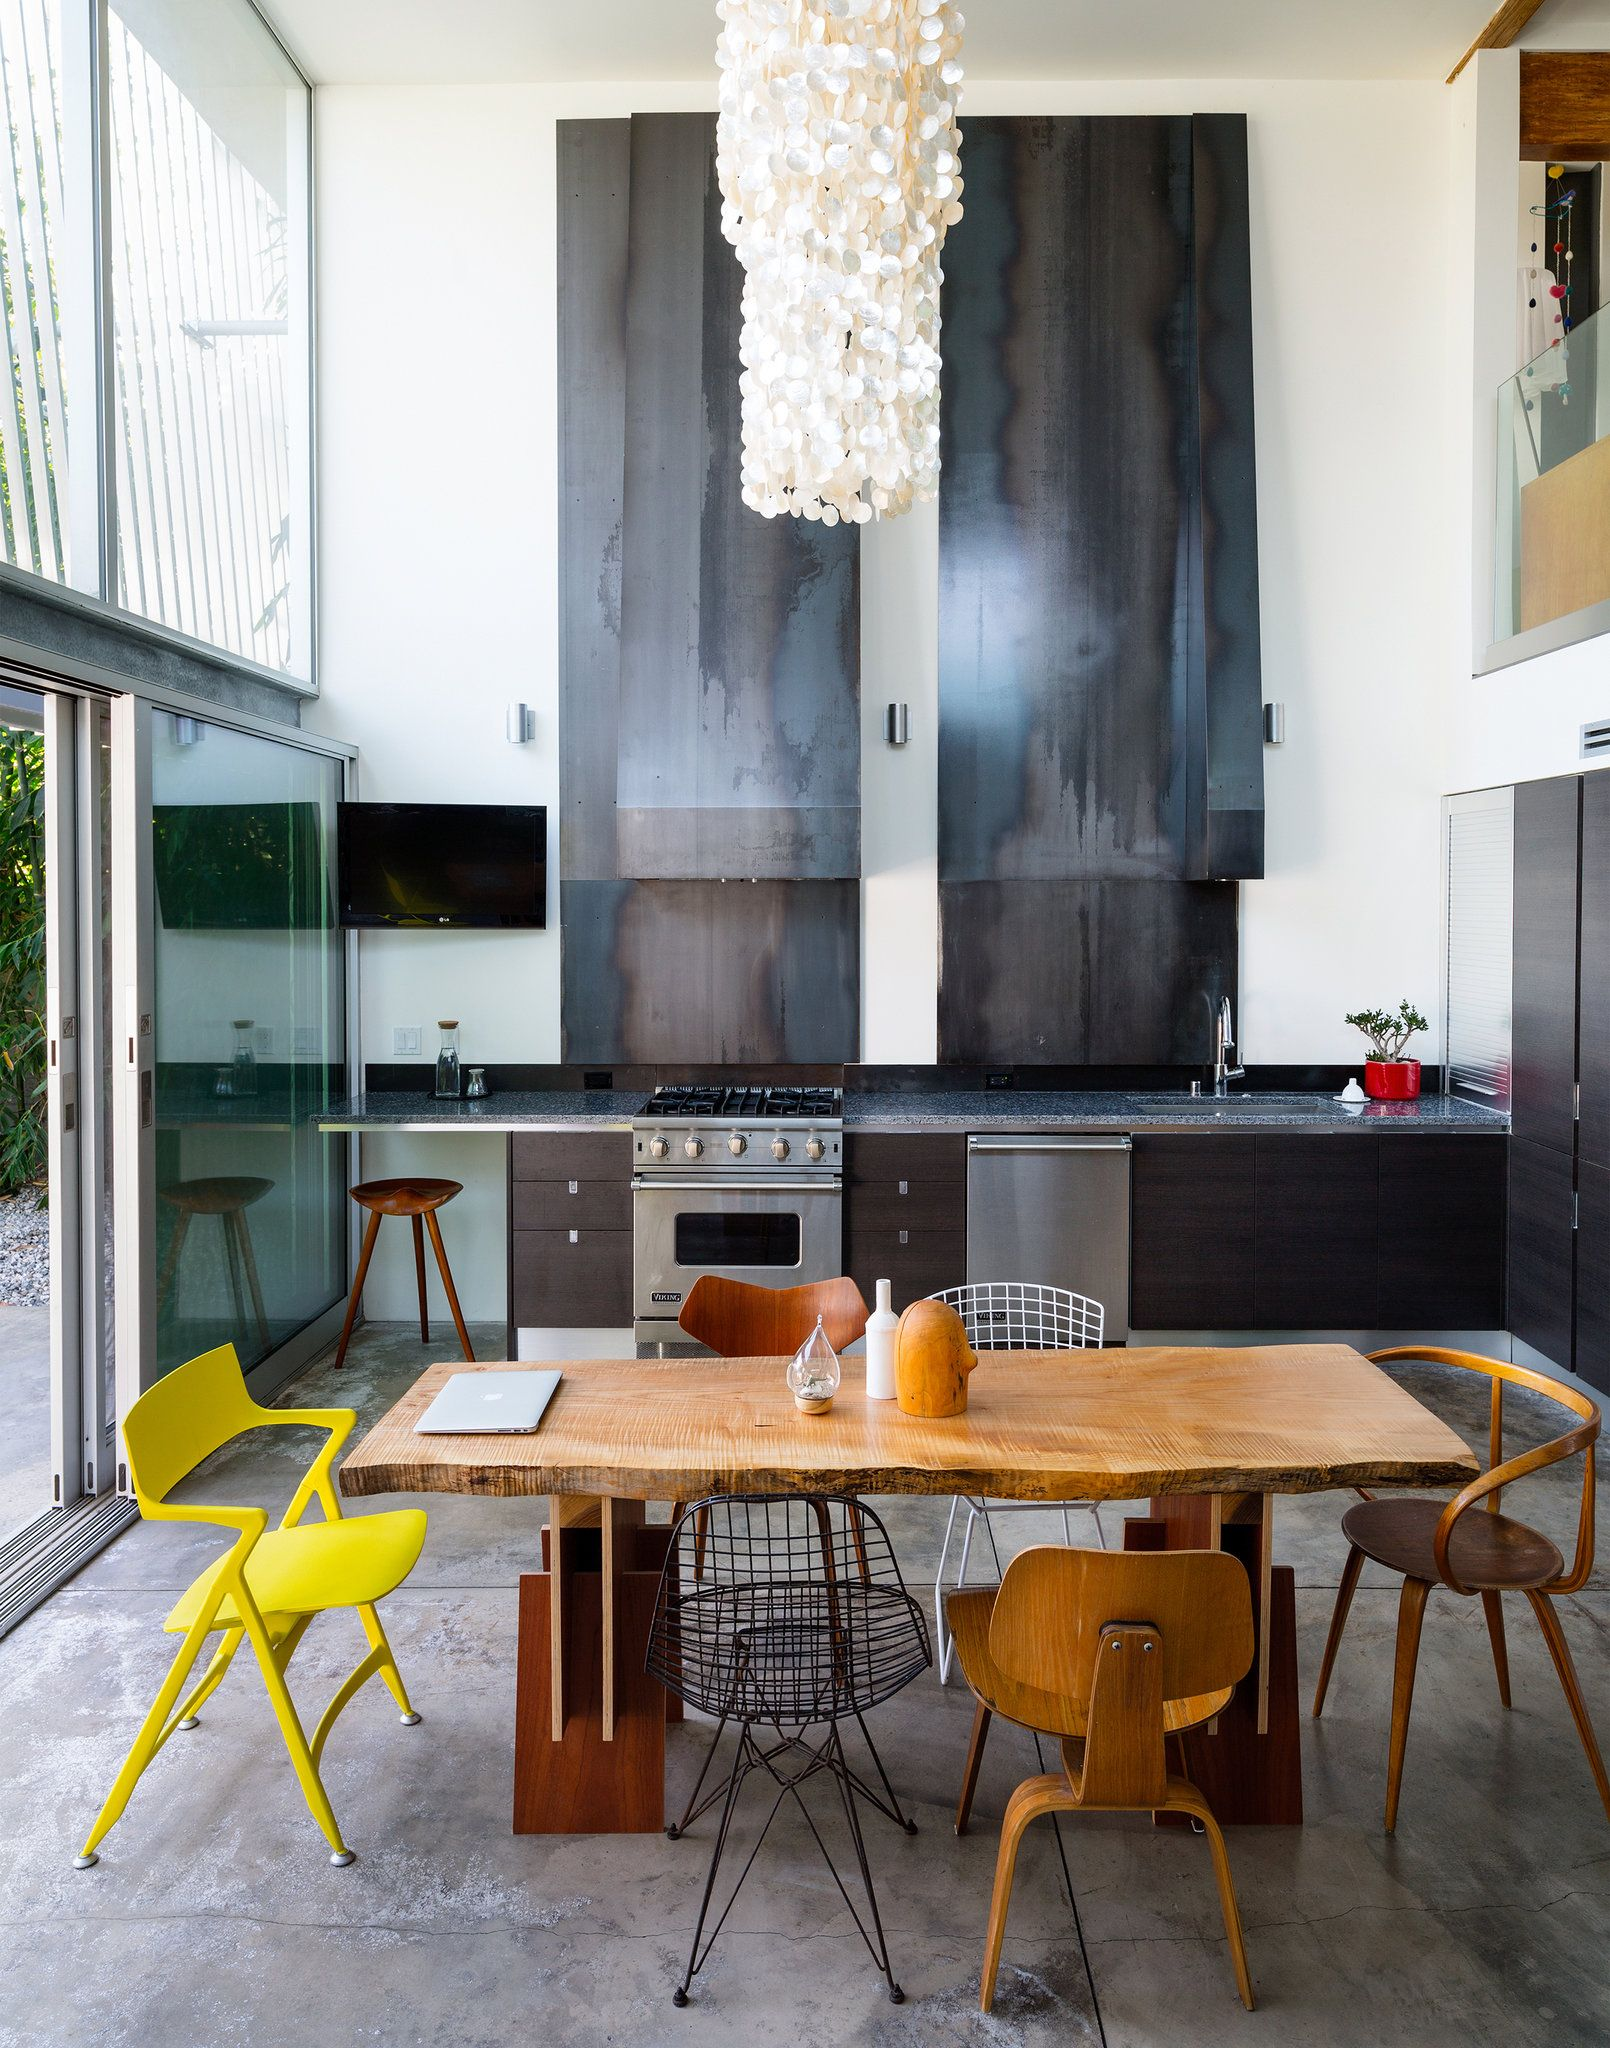 Interior design | decoration | home decor | kitchen | furniture ...